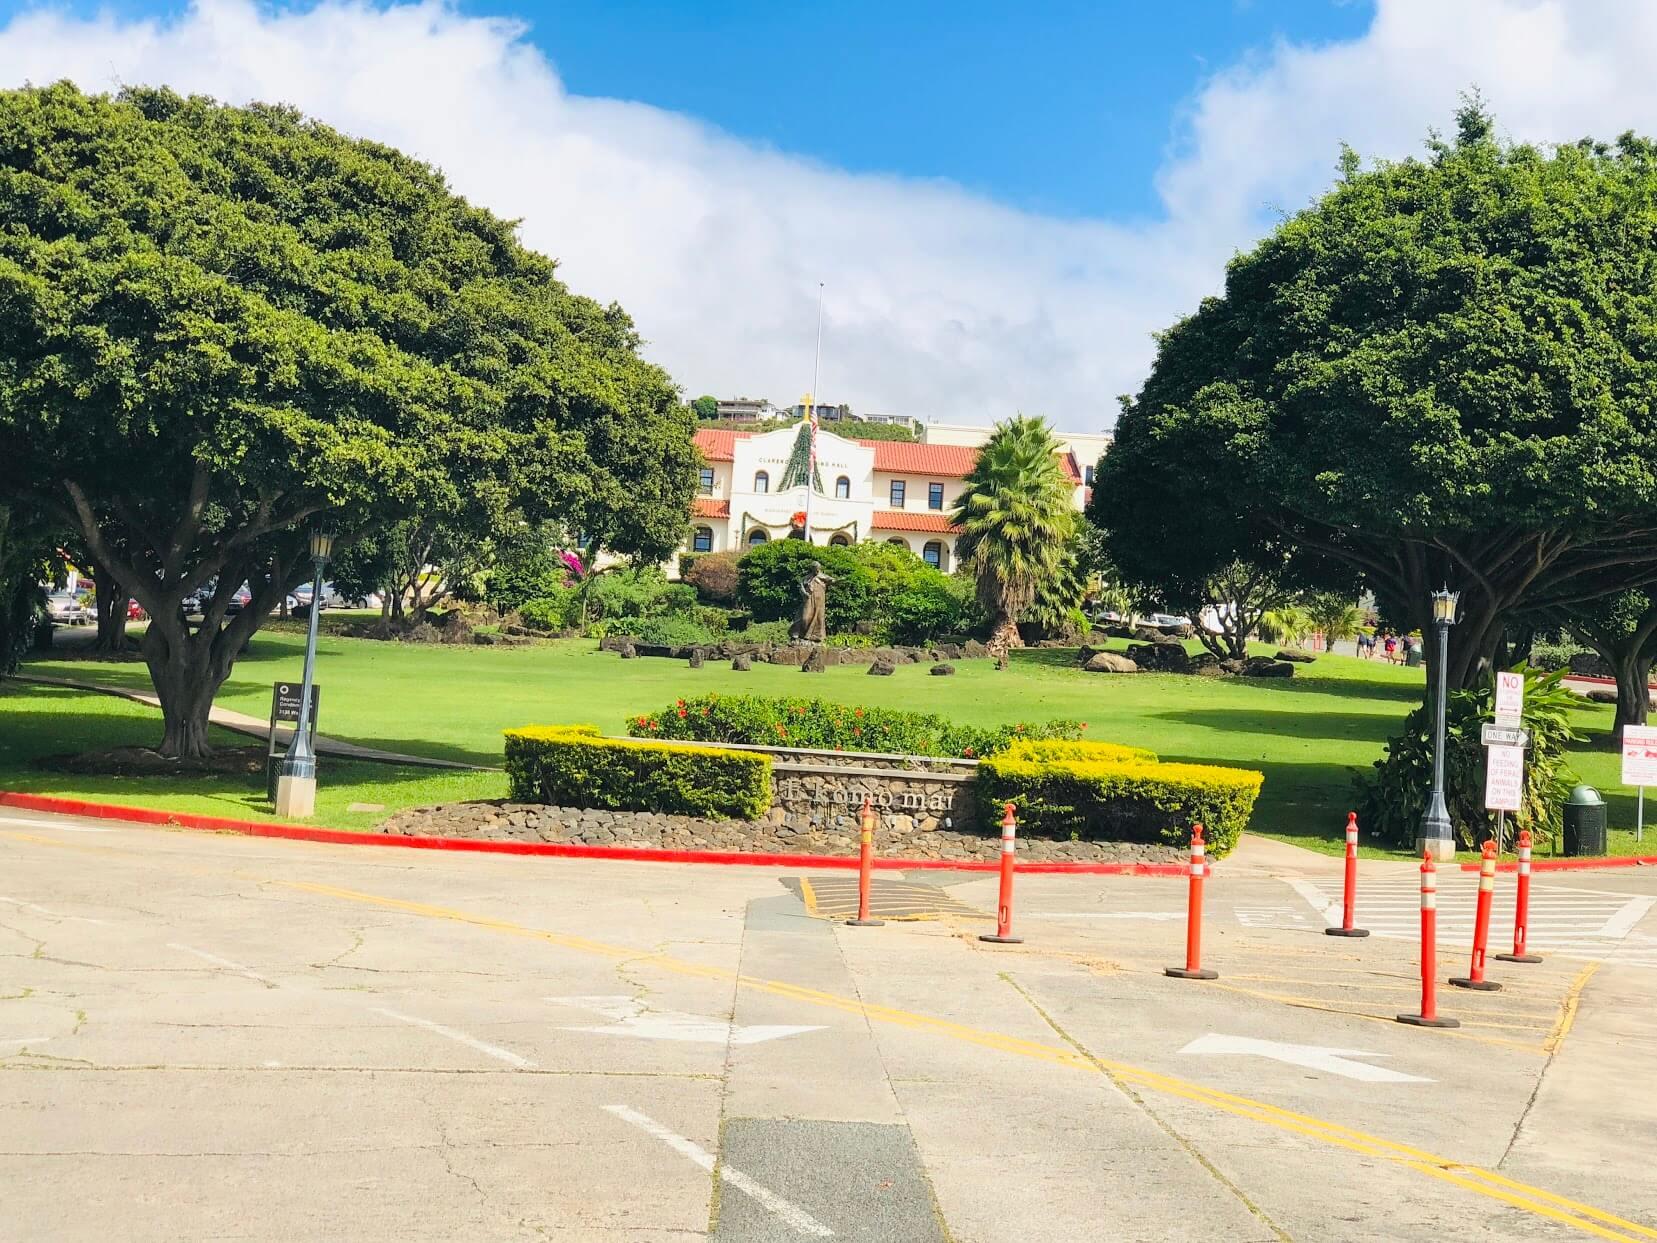 Regency Parkの外観